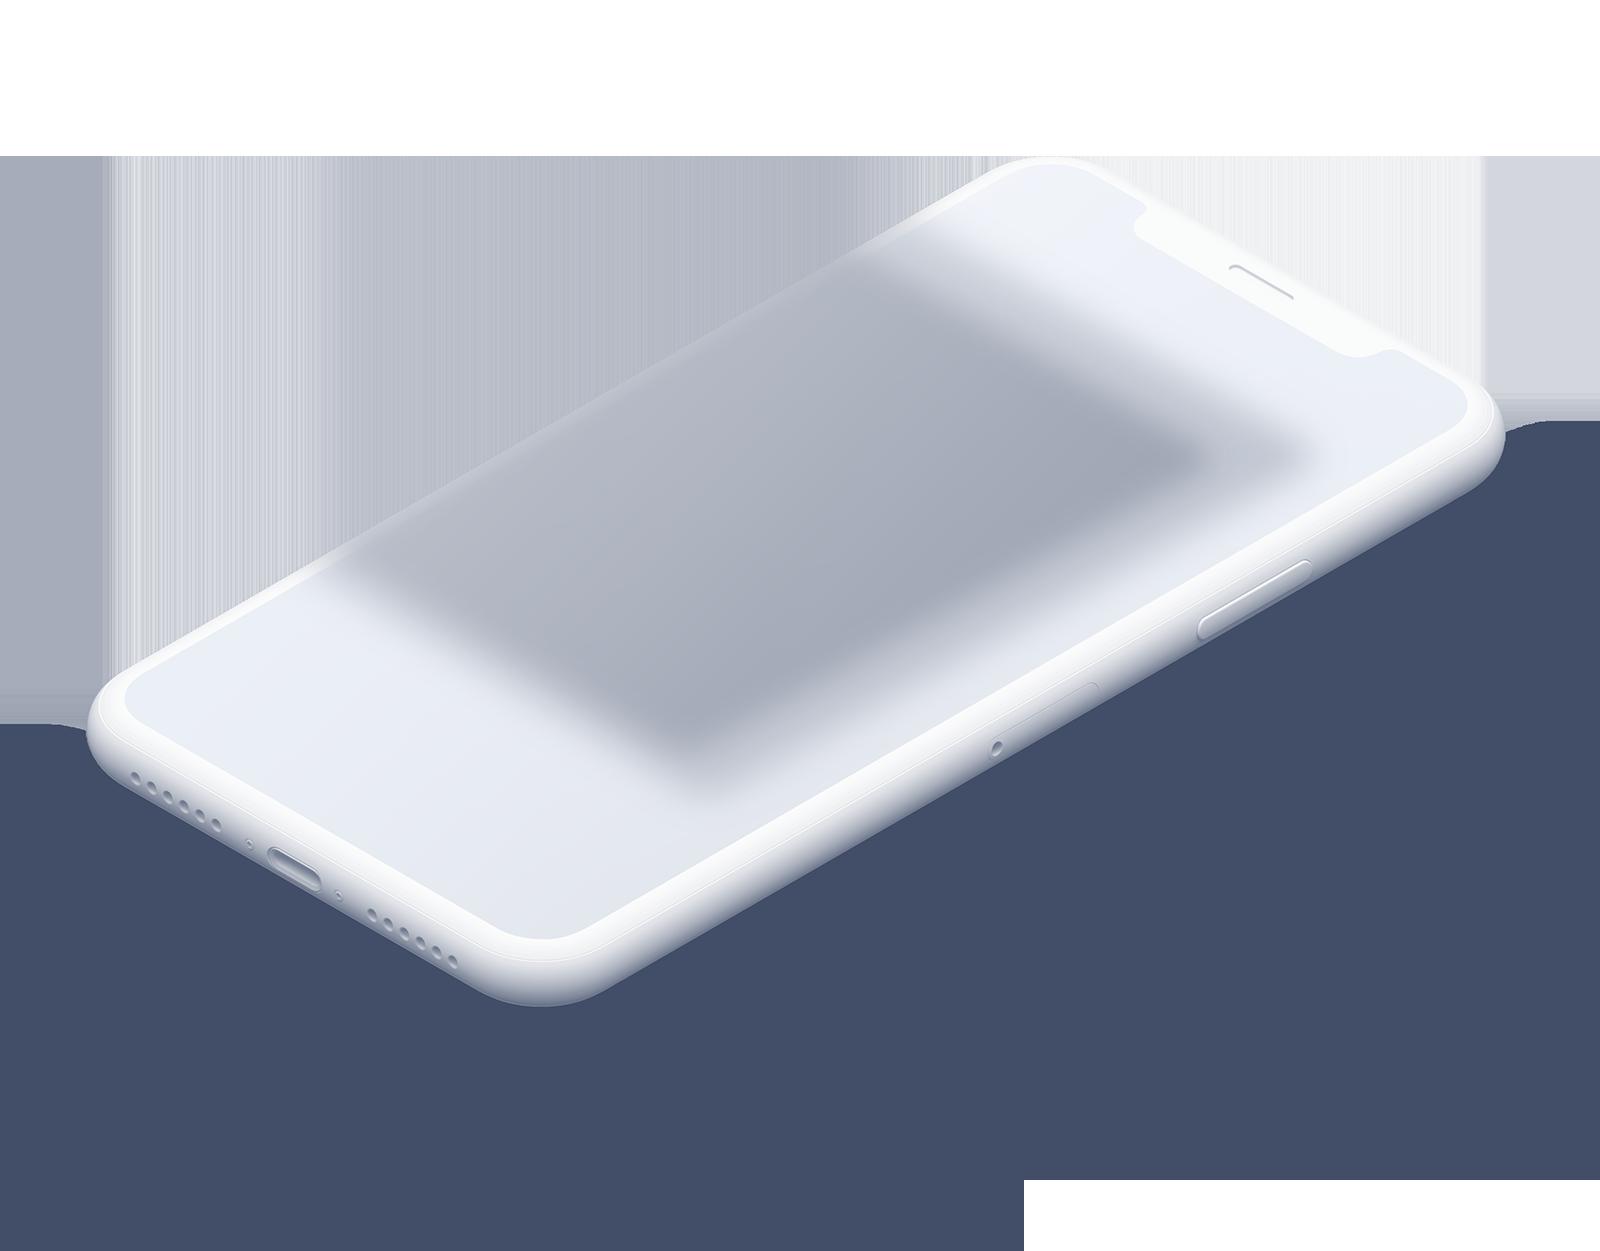 Ux Ui phone mockup 001